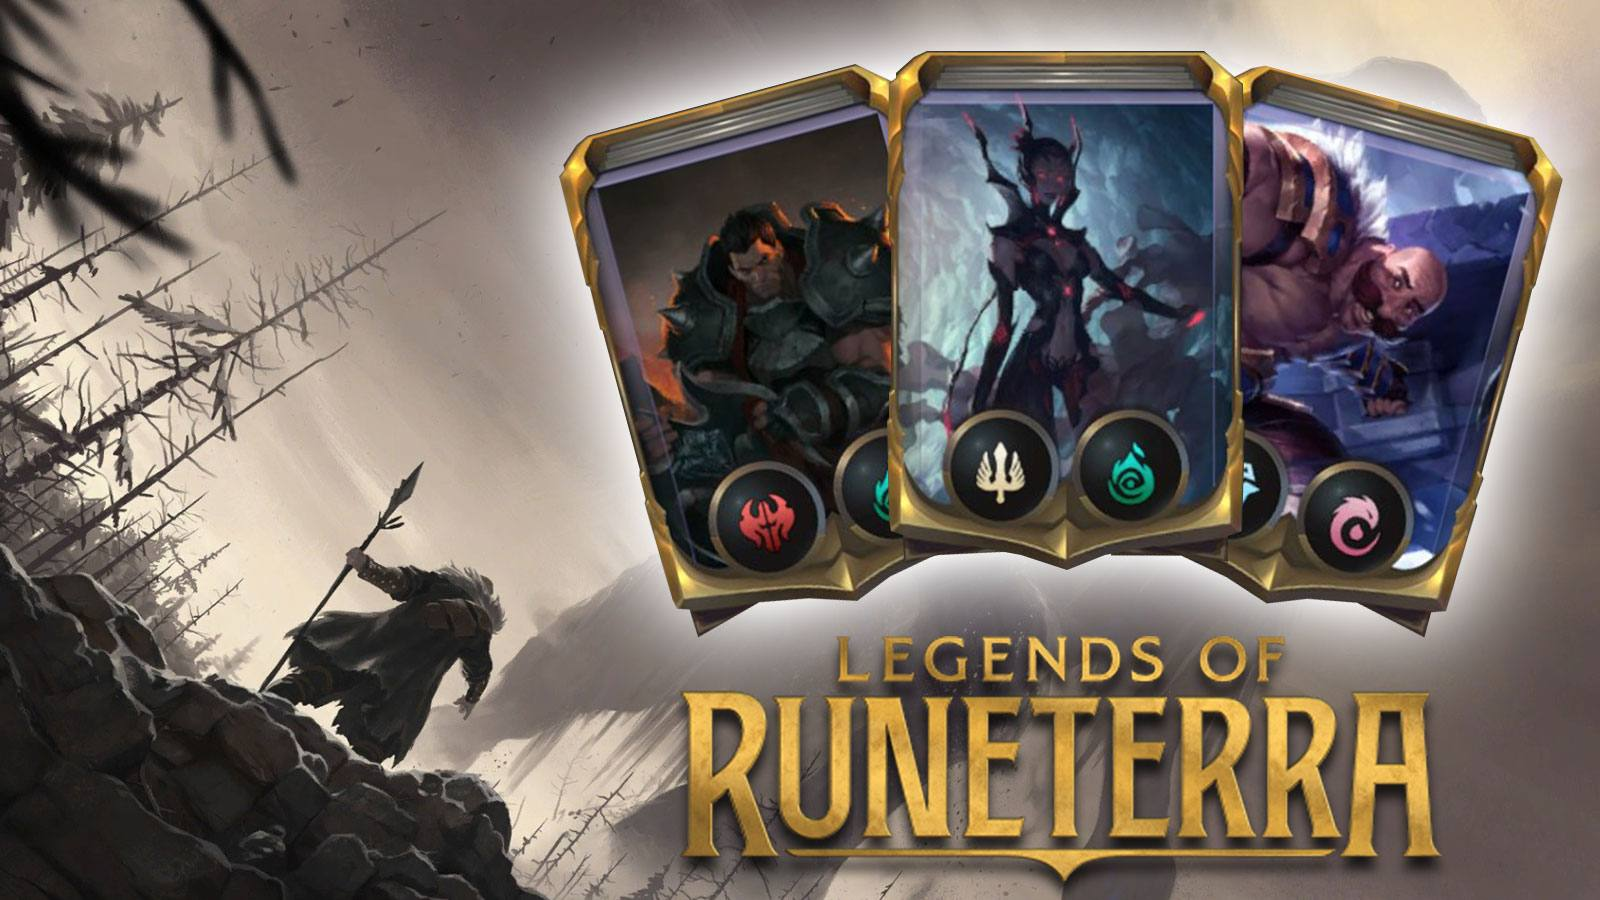 3 decks surplombant le logo de Legends of Runeterra